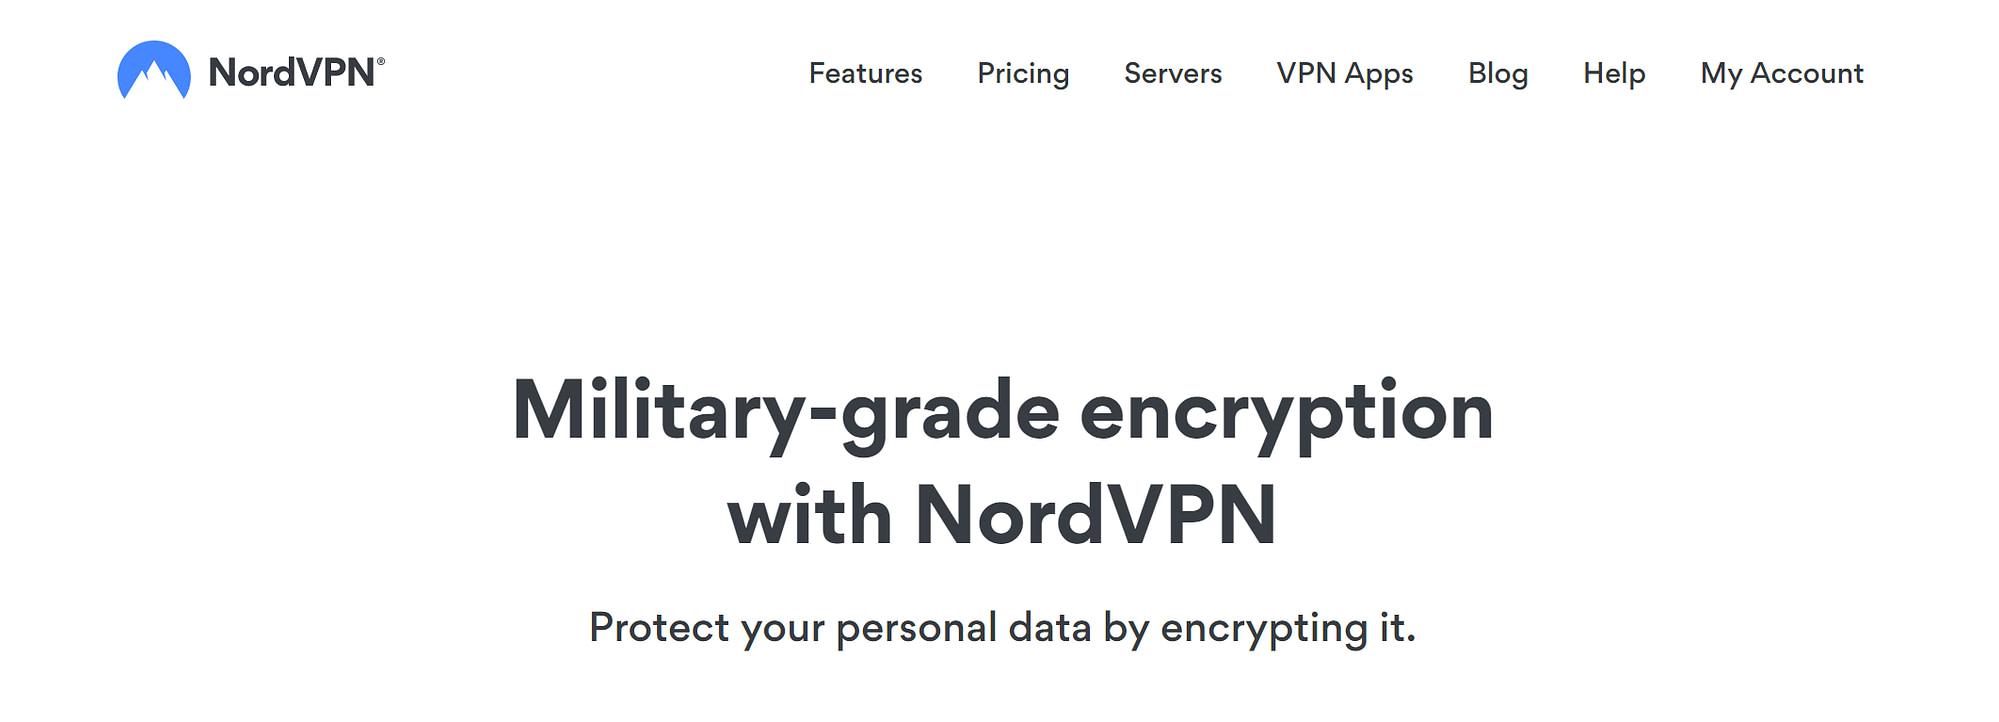 How a good VPN uses encryption